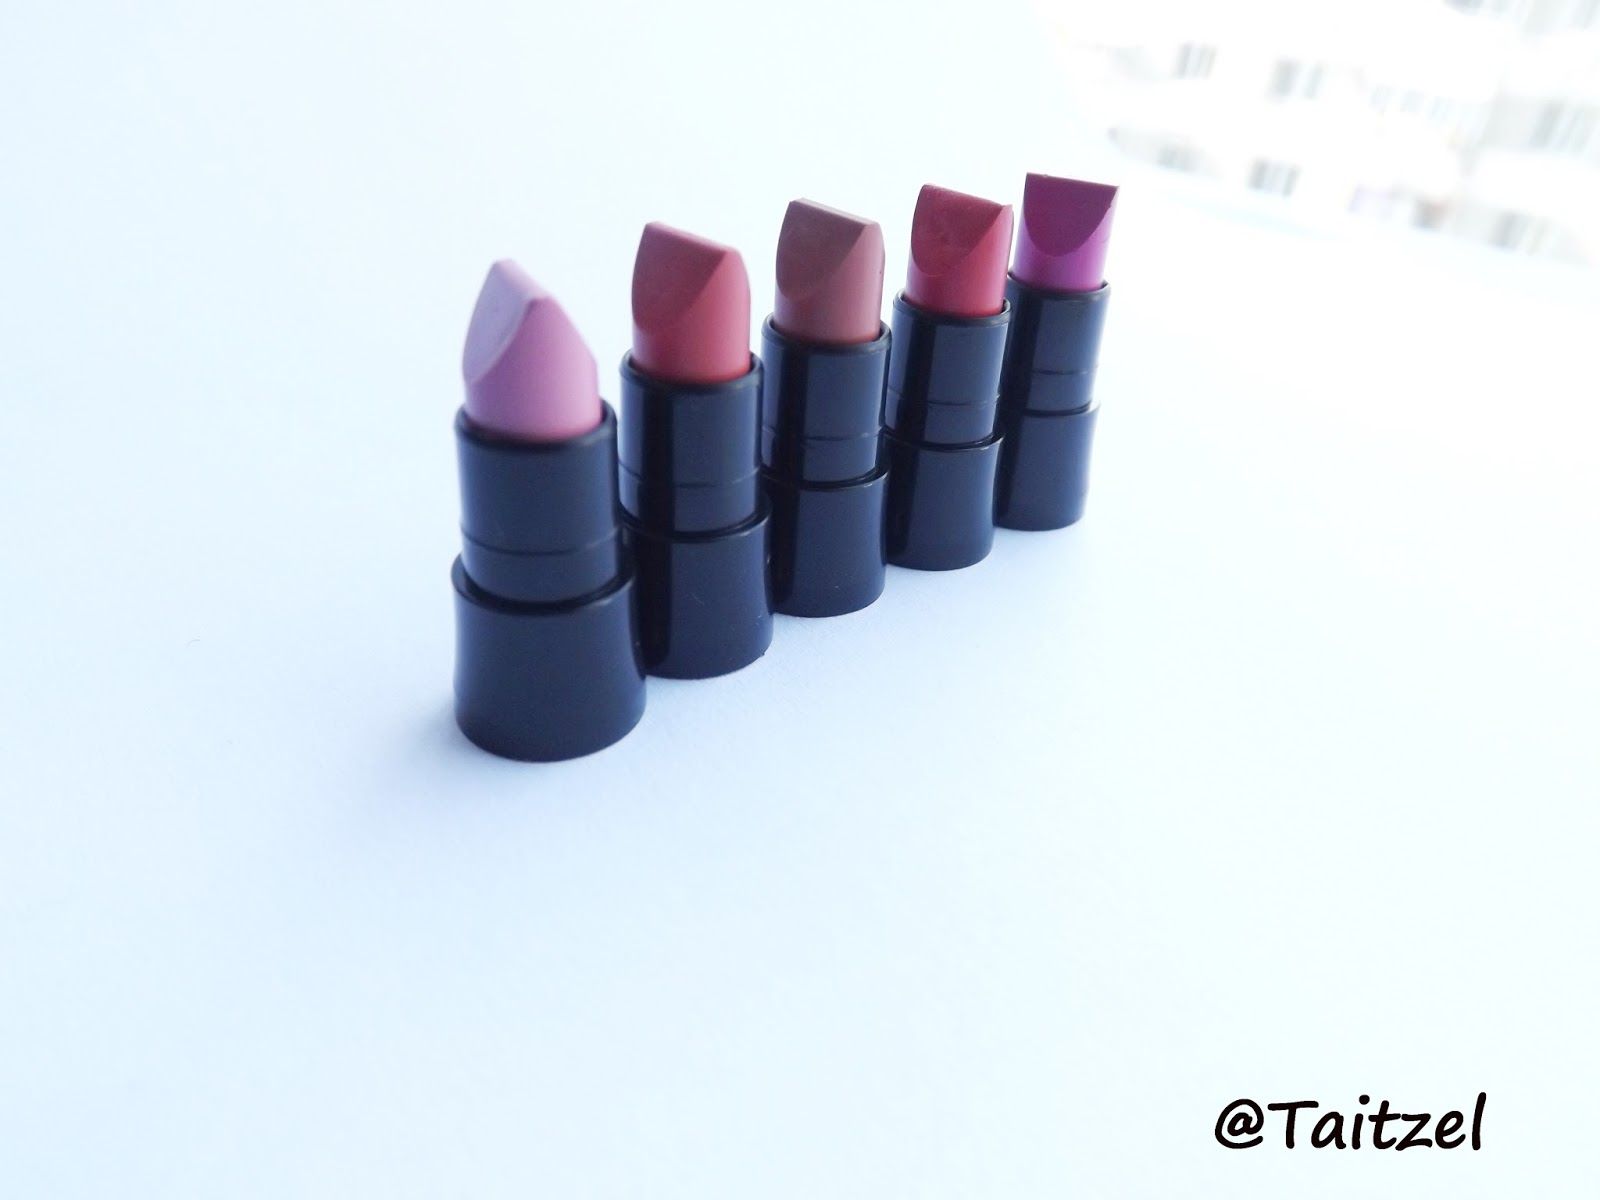 Avon Ultra Color Matte Ruj Review Swatch Taitzel Beauty